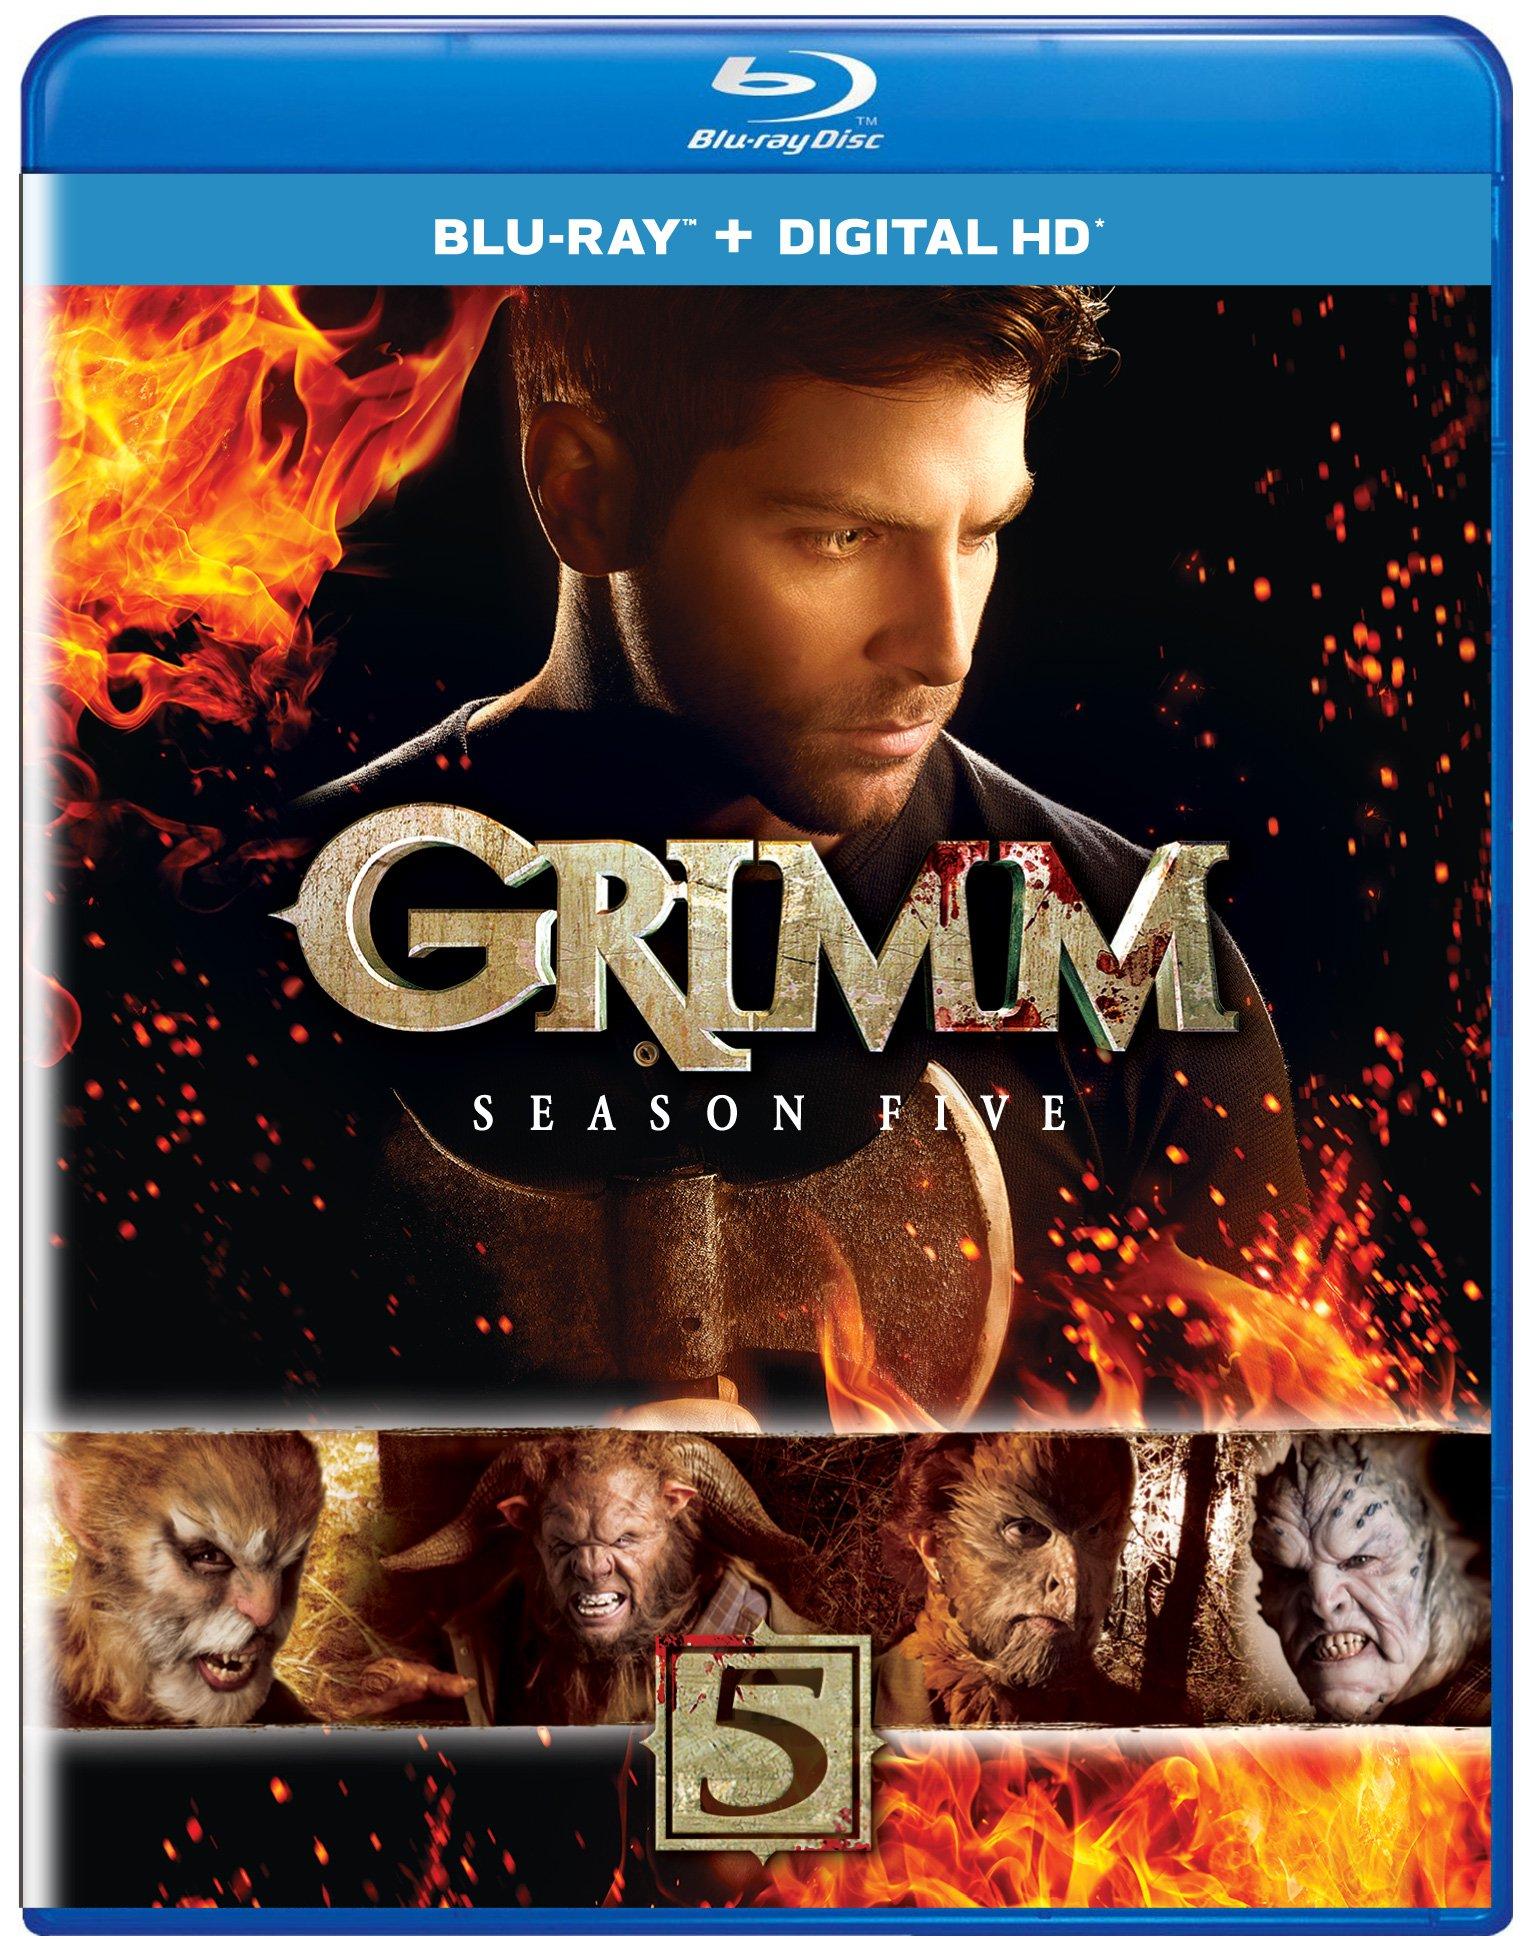 Grimm: Season Five (Blu-Ray + Digital Hd) 4